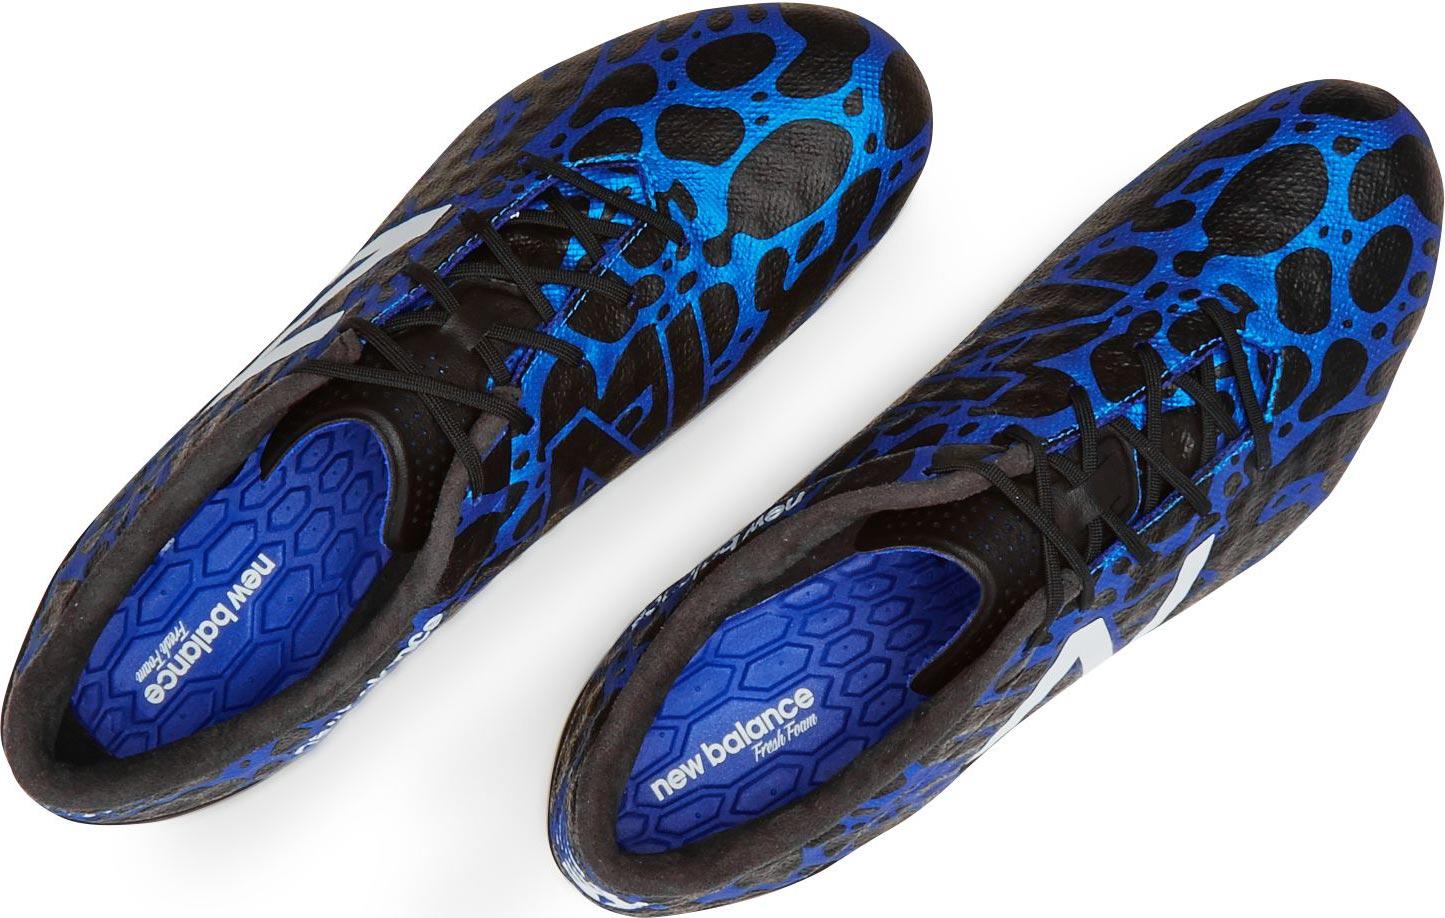 limited-edition-new-balance-visaro-galaxy-boots-overhead